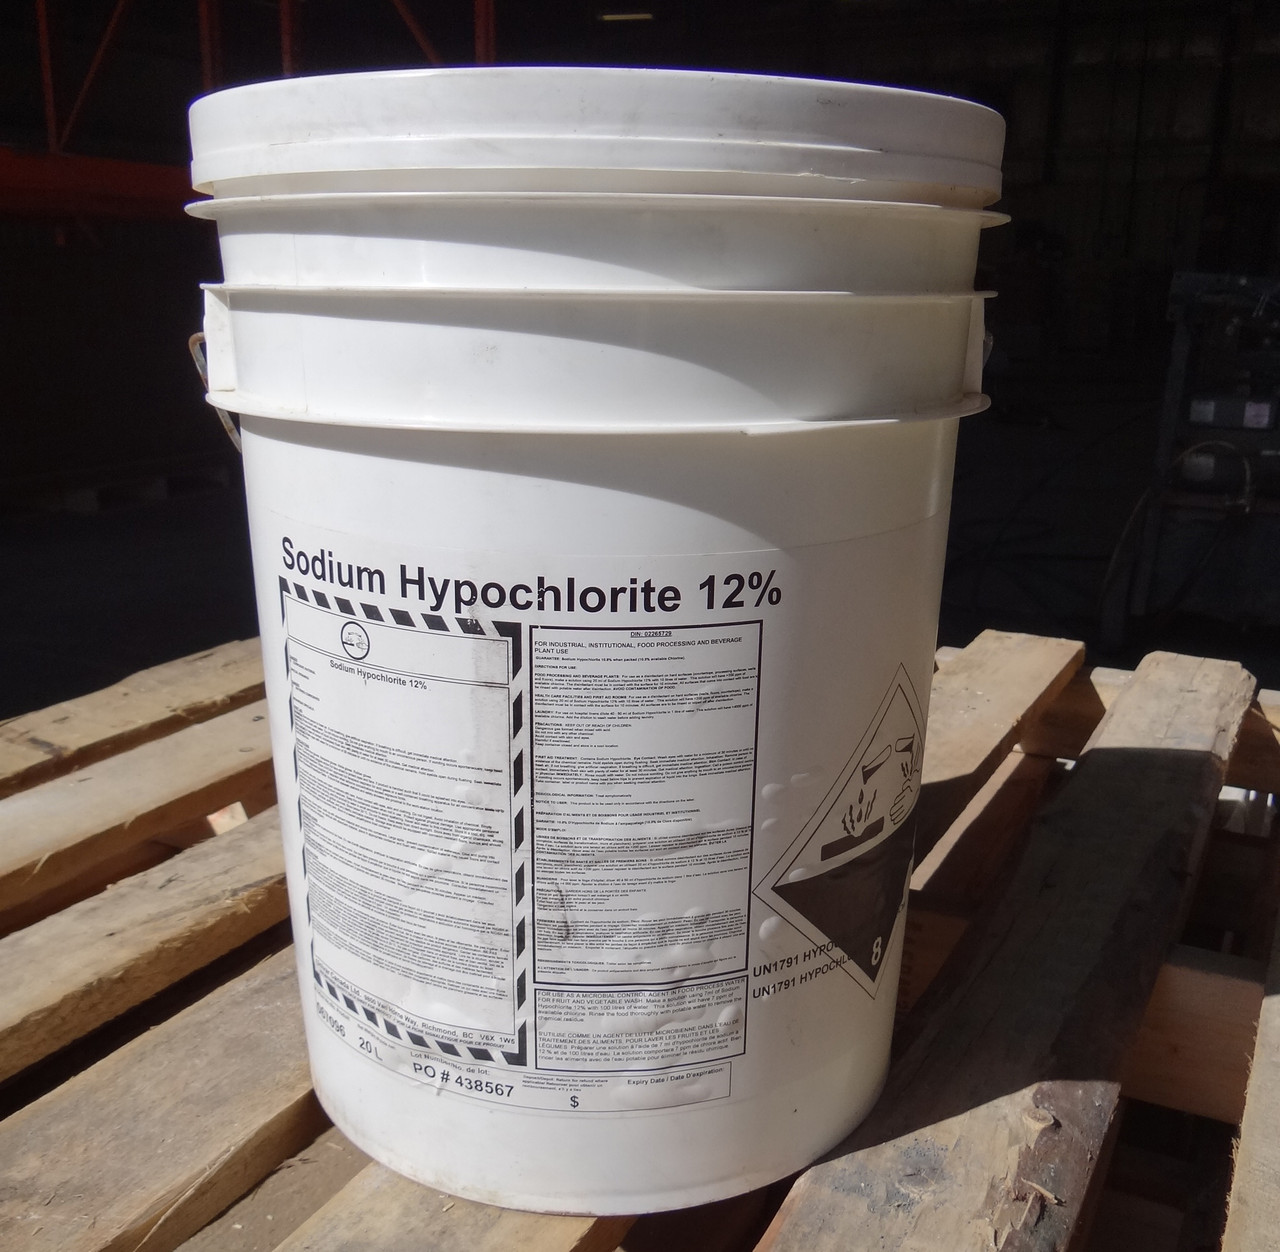 Dodge Packaging 187 Sodium Hypochlorite 12 Industrial